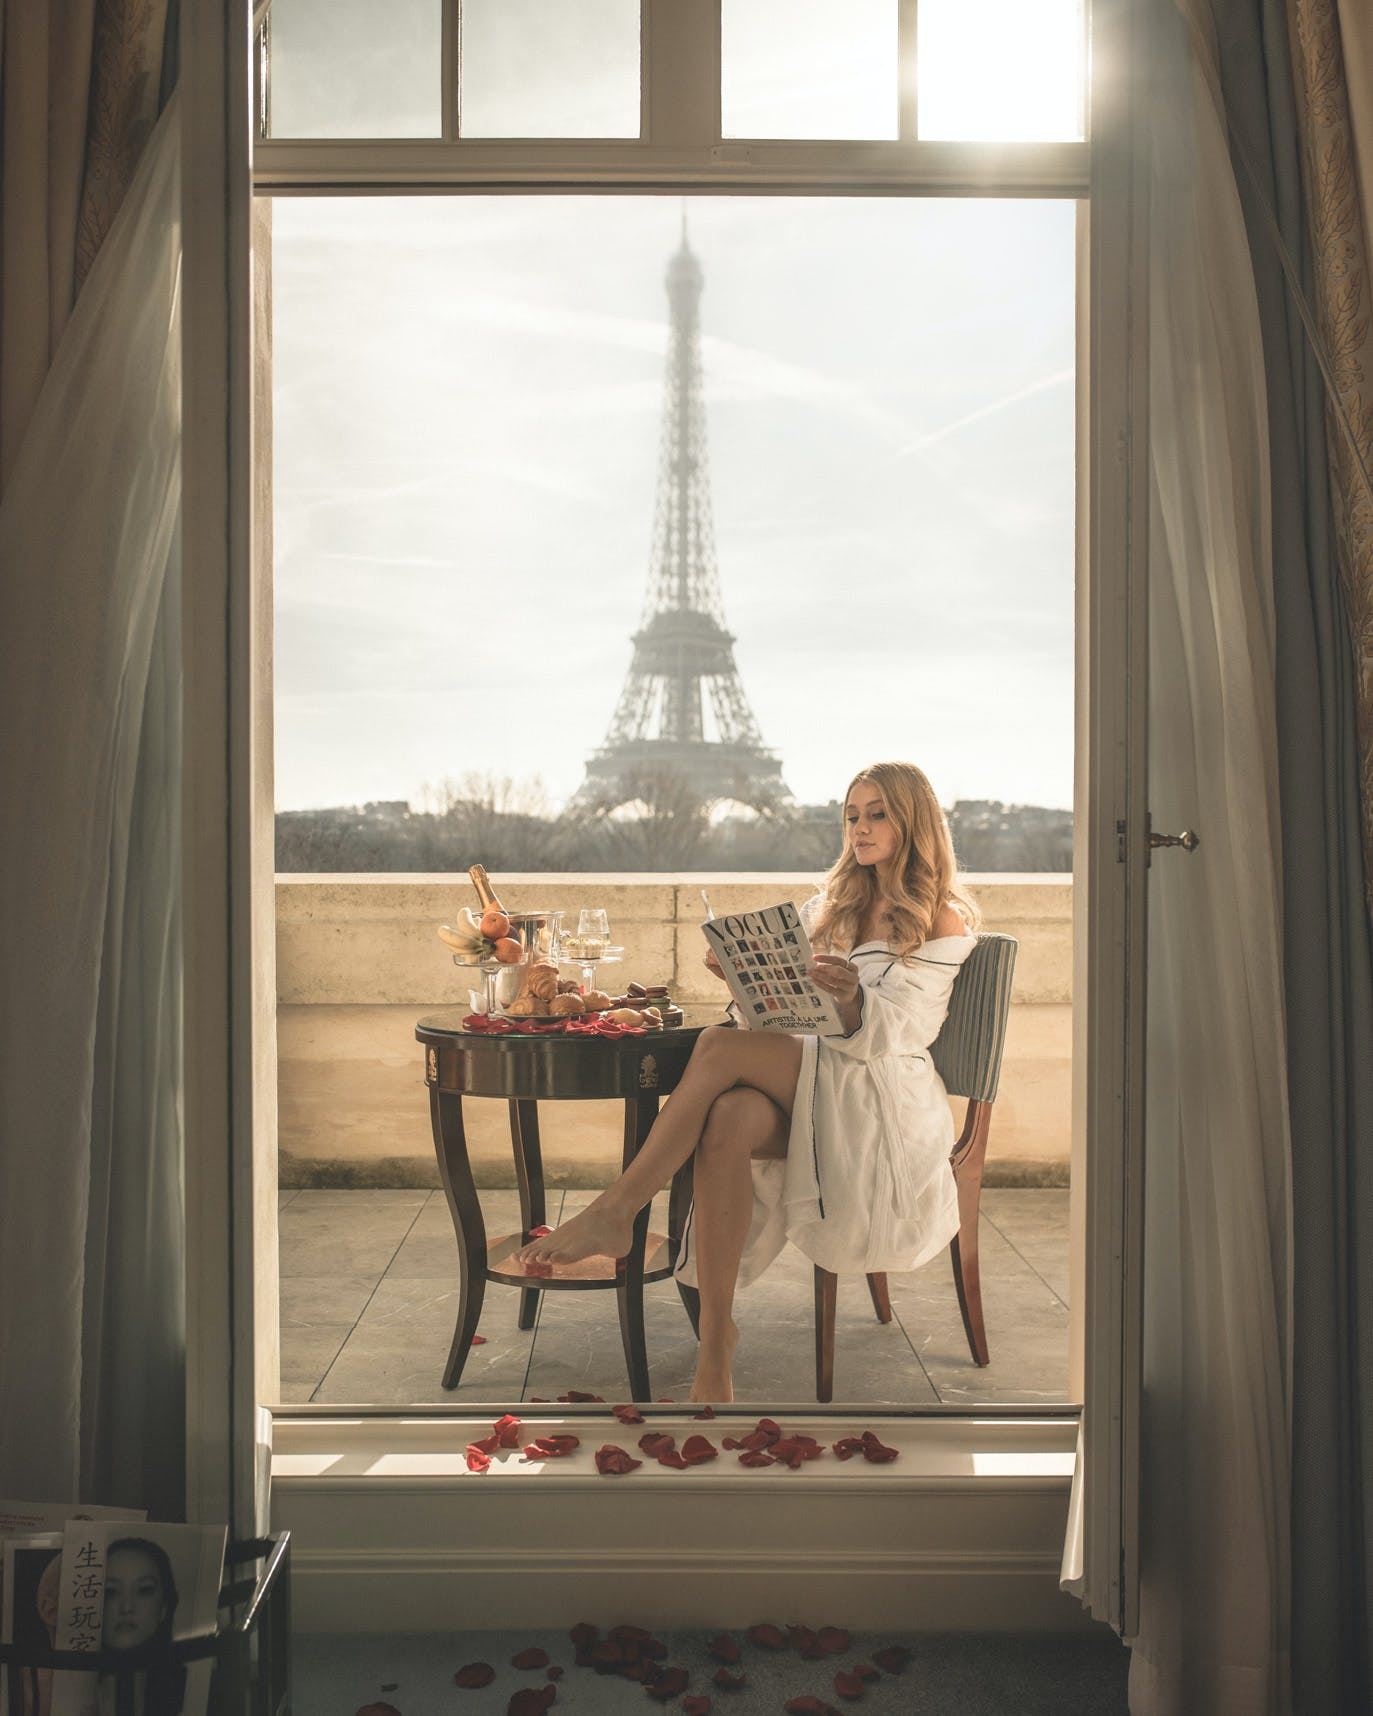 Shangri-La Hotel Eiffel Tower King Bedroom